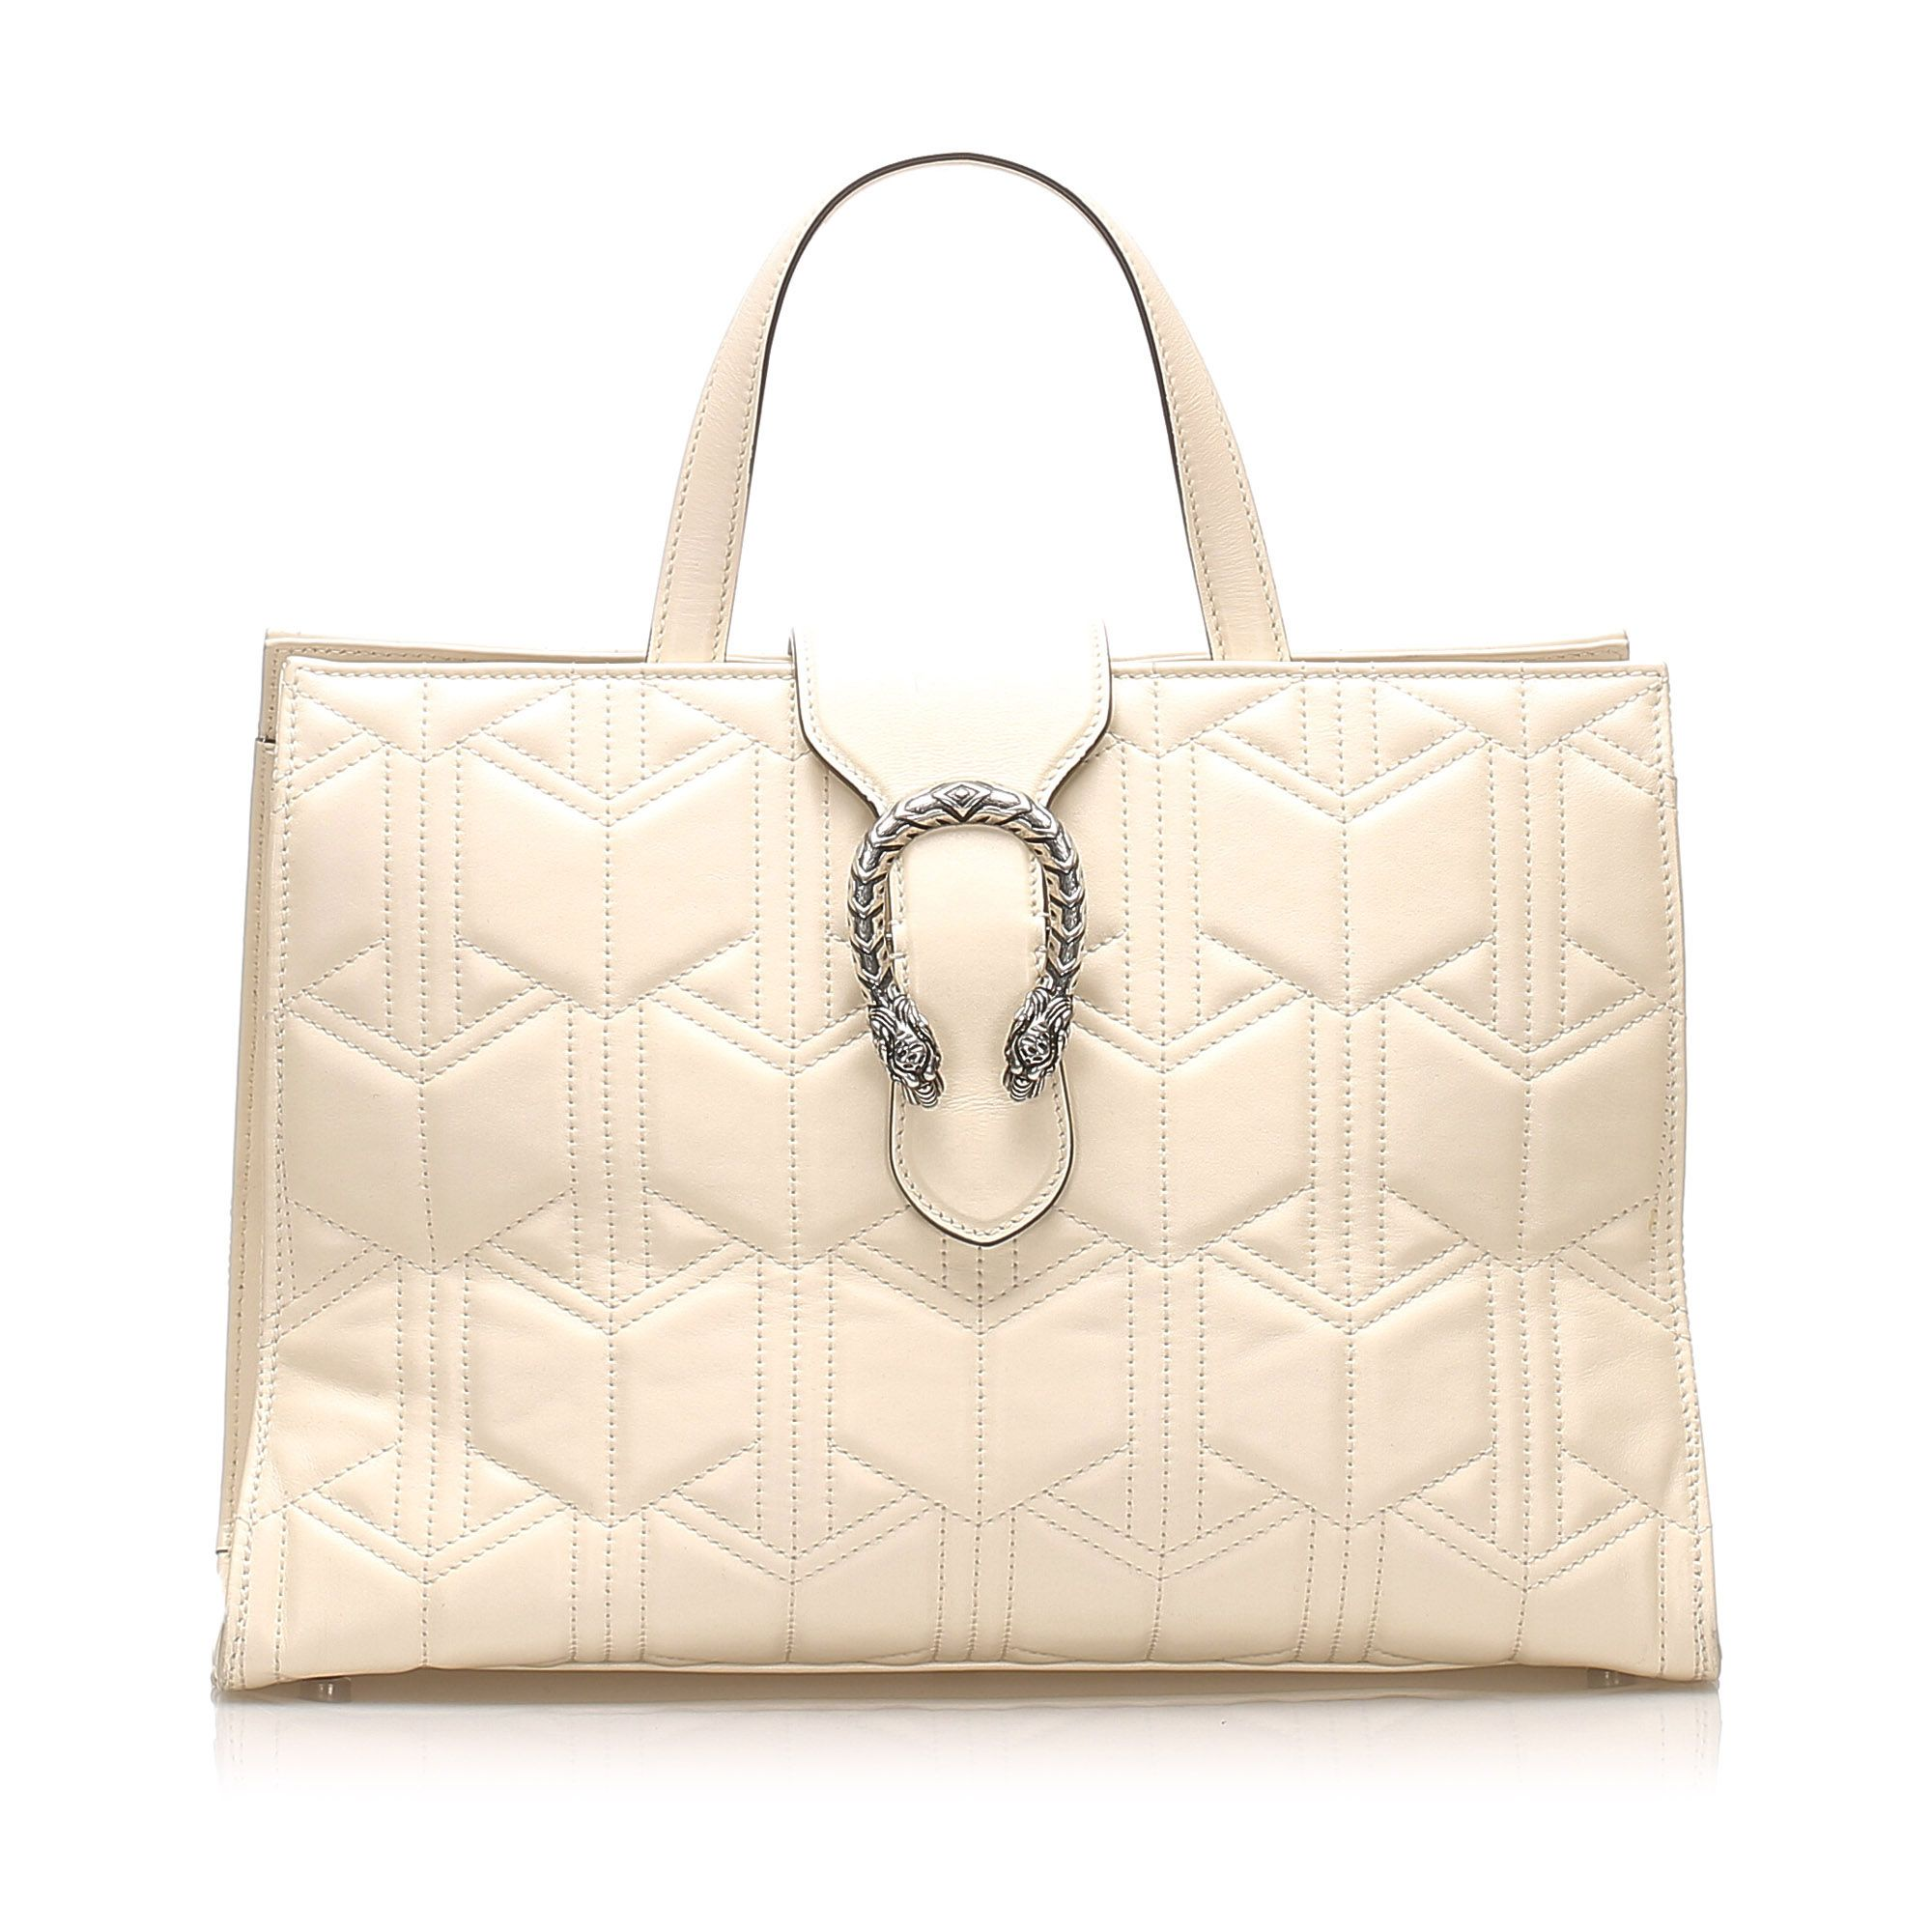 Vintage Gucci Matelasse Dionysus Leather Satchel White